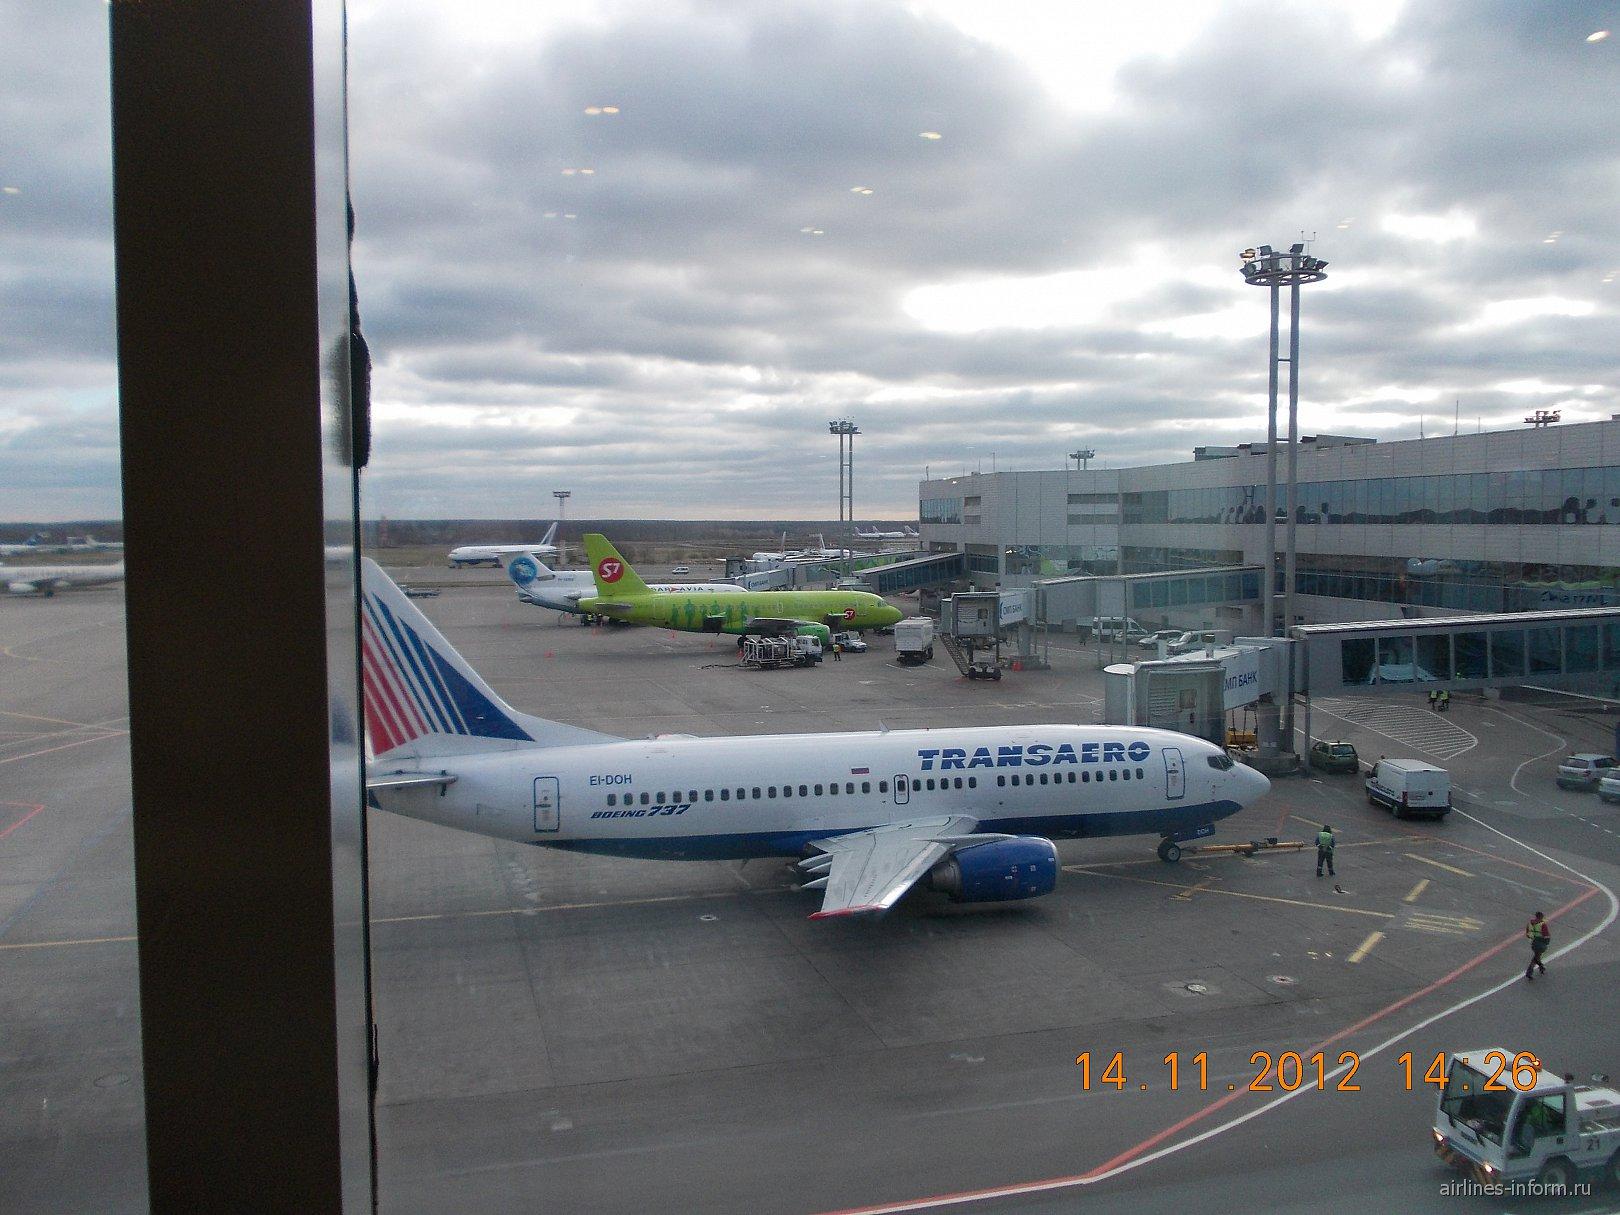 Боинг-737 Трансаэро в аэропорту Домодедово